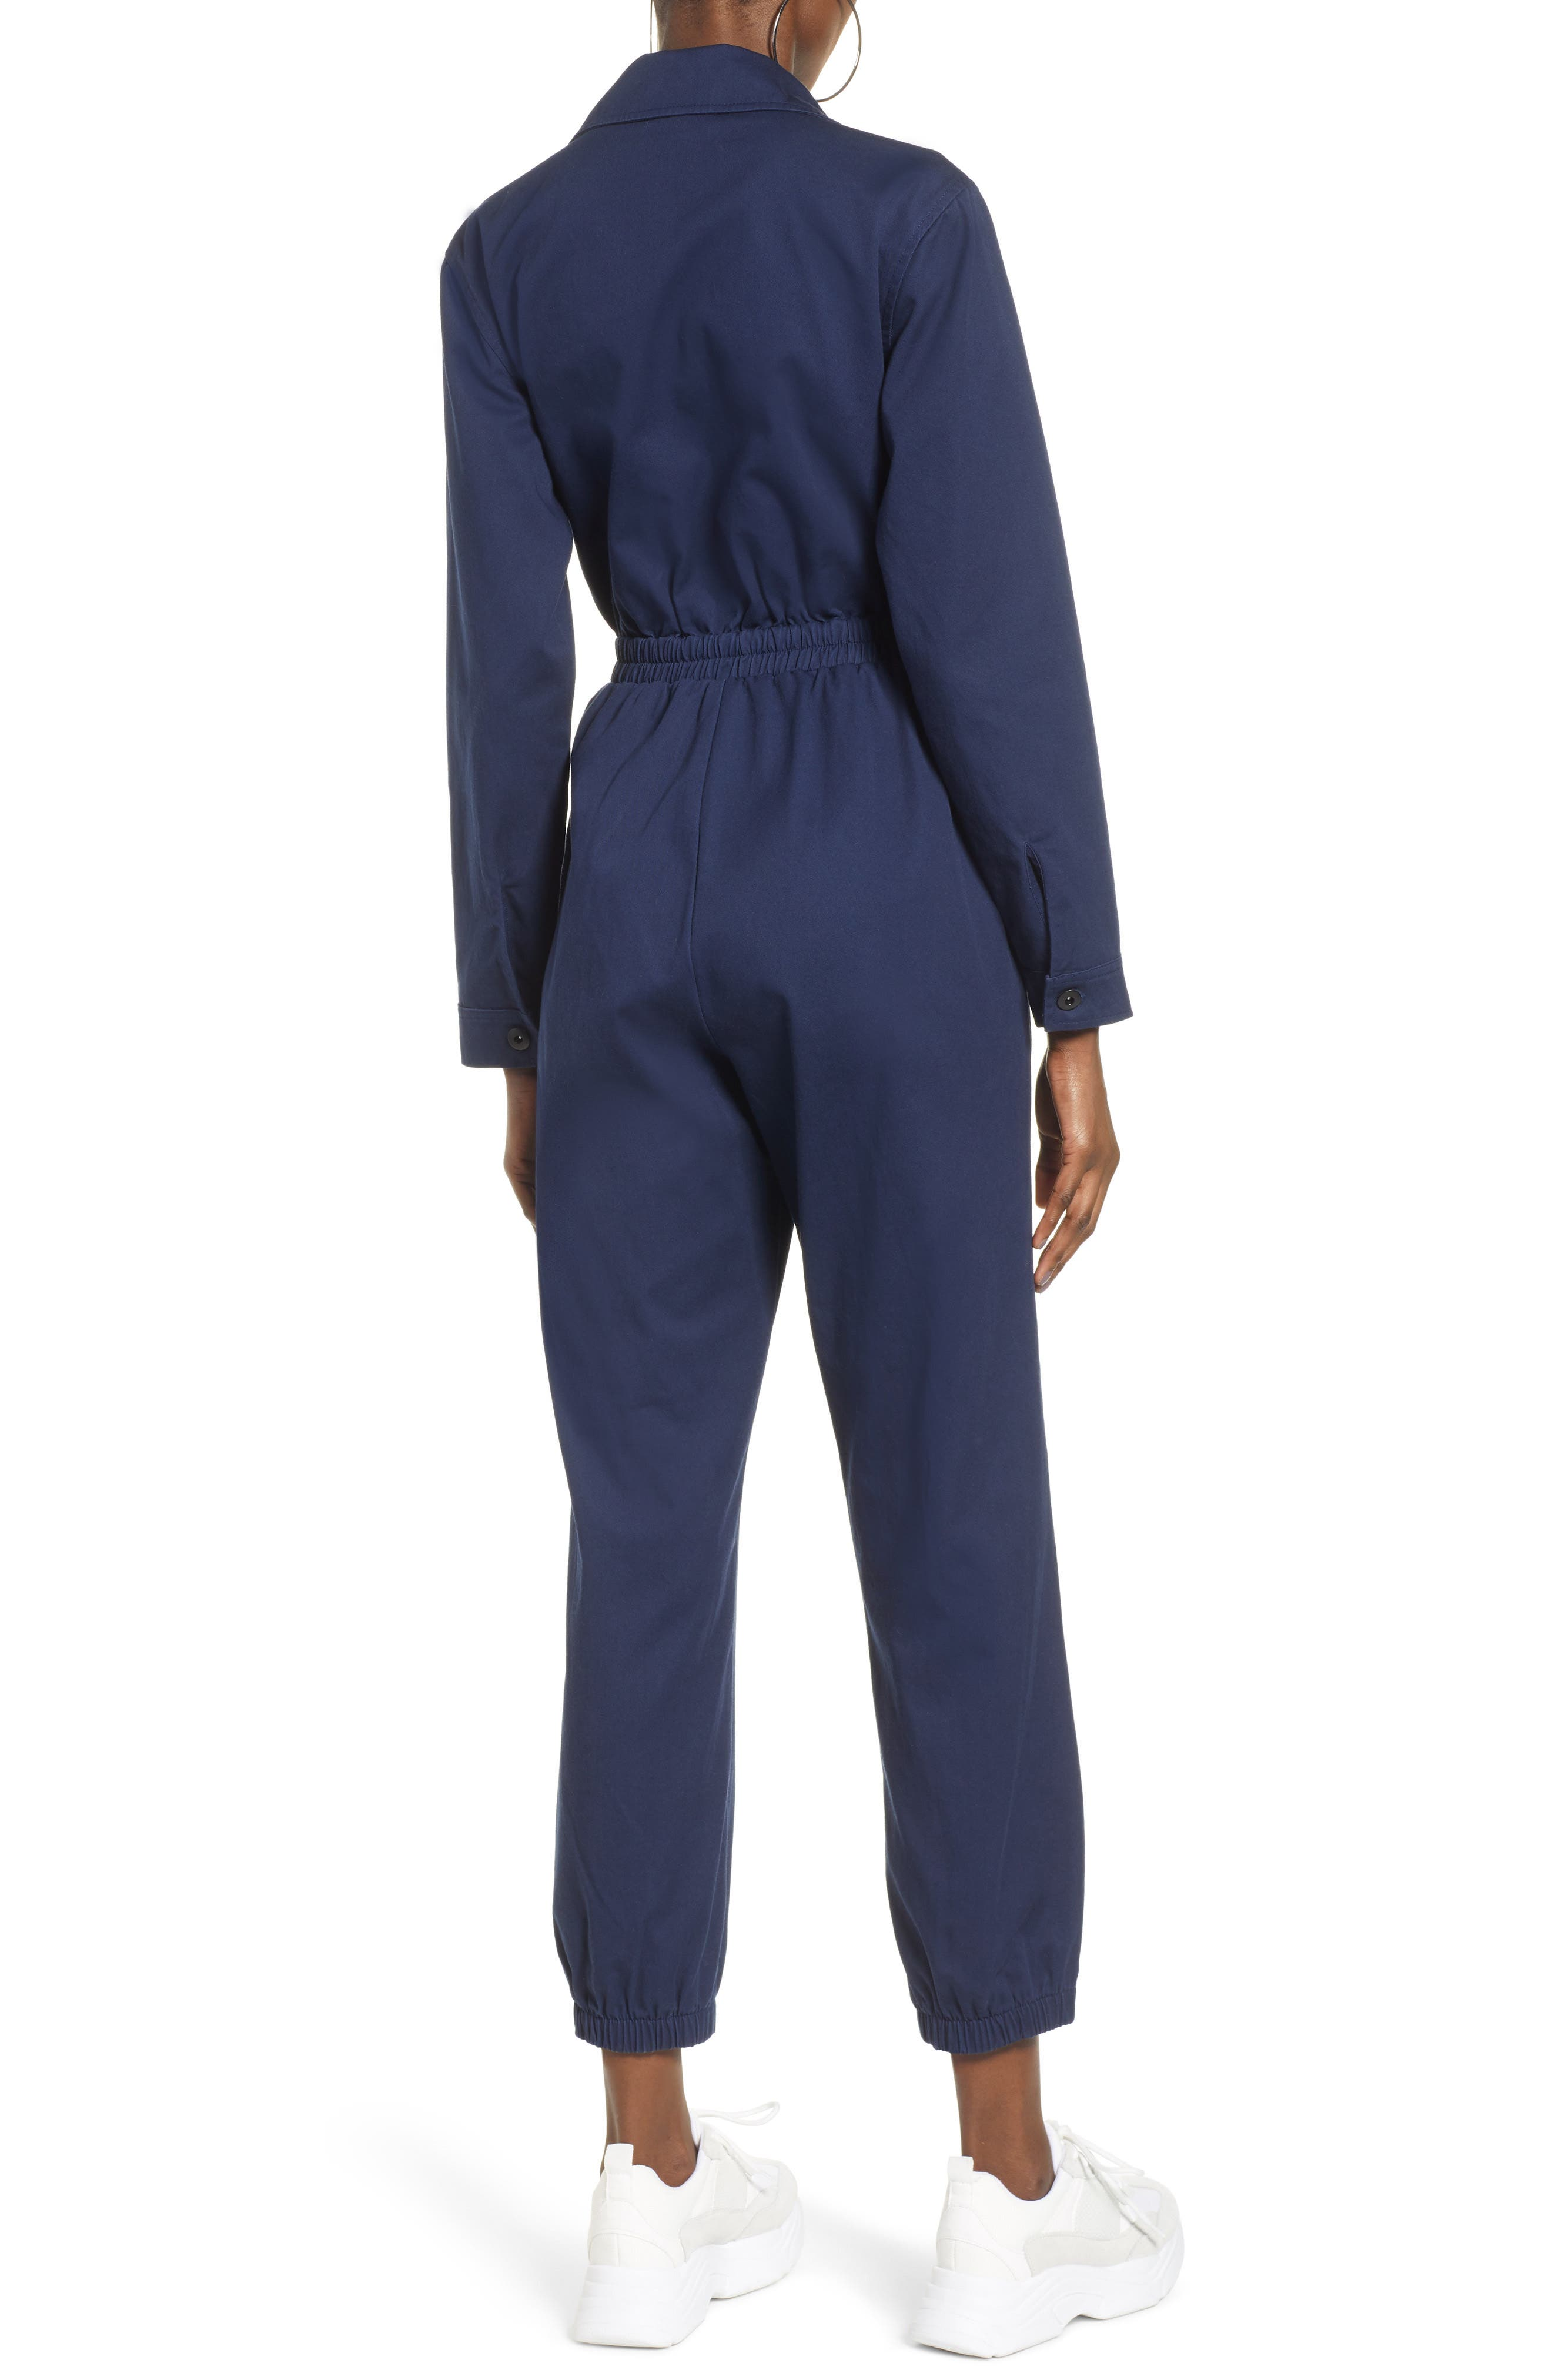 TEN SIXTY SHERMAN,                             Twill Workwear Jumpsuit,                             Alternate thumbnail 2, color,                             OXFORD BLUE